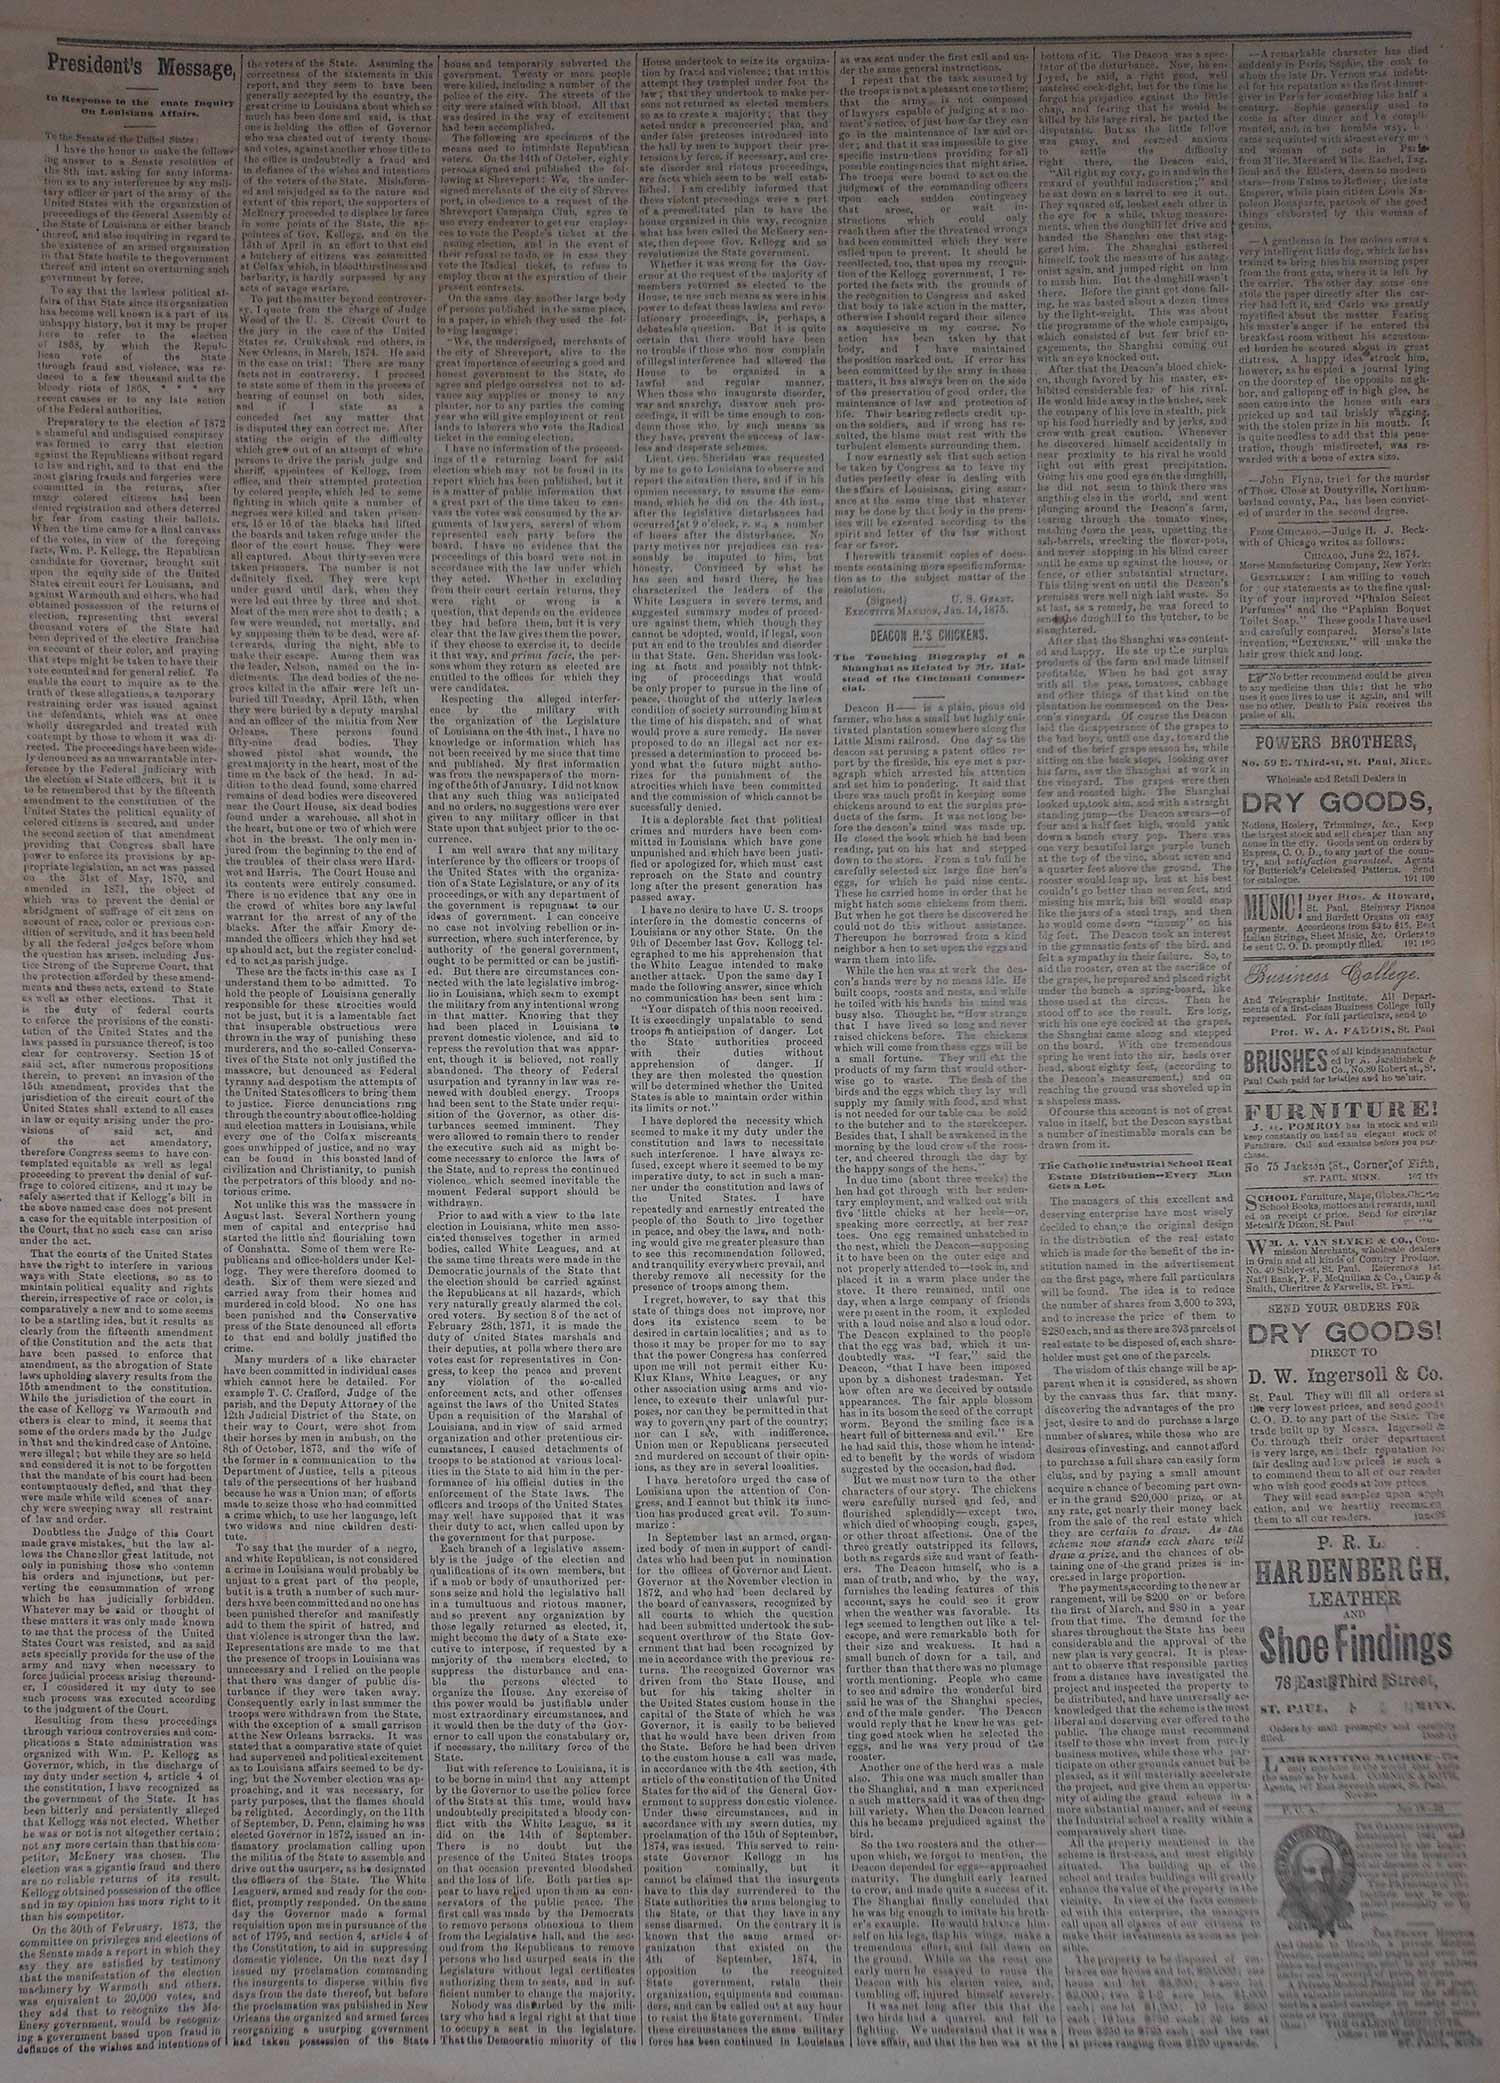 1/20/1875, p3